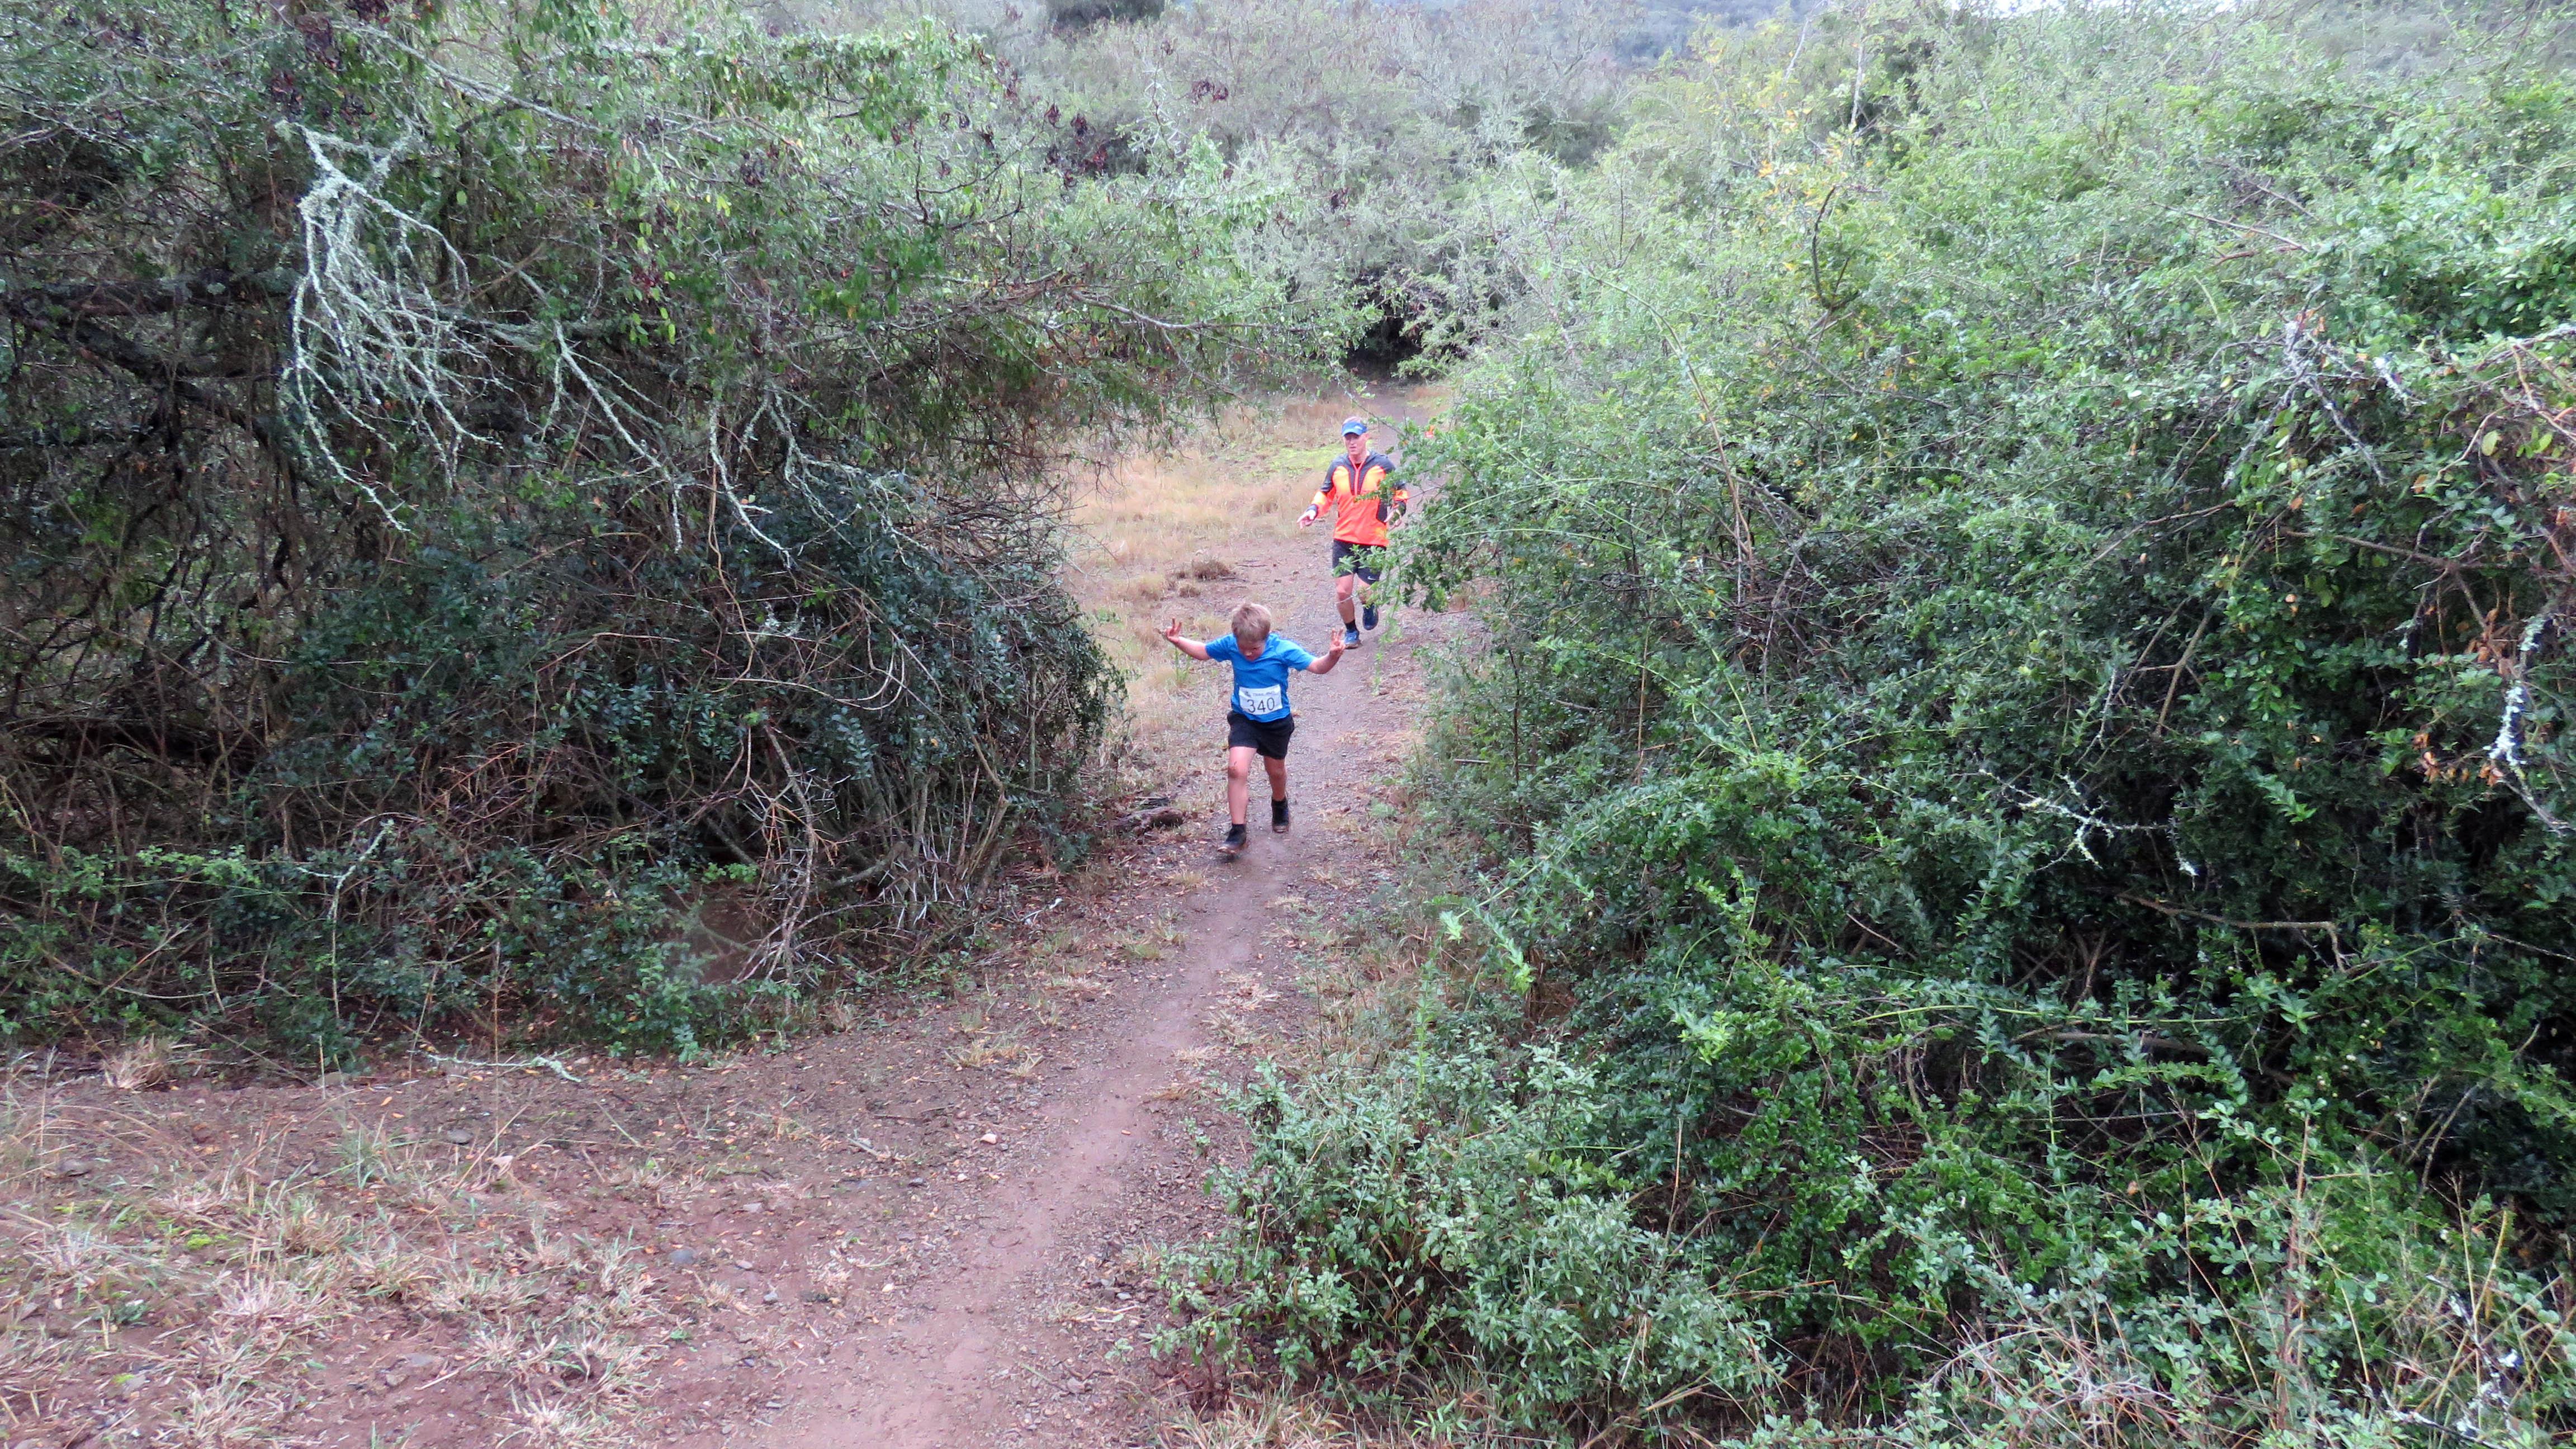 hayterdale trailrun 2018-08-05  (39)